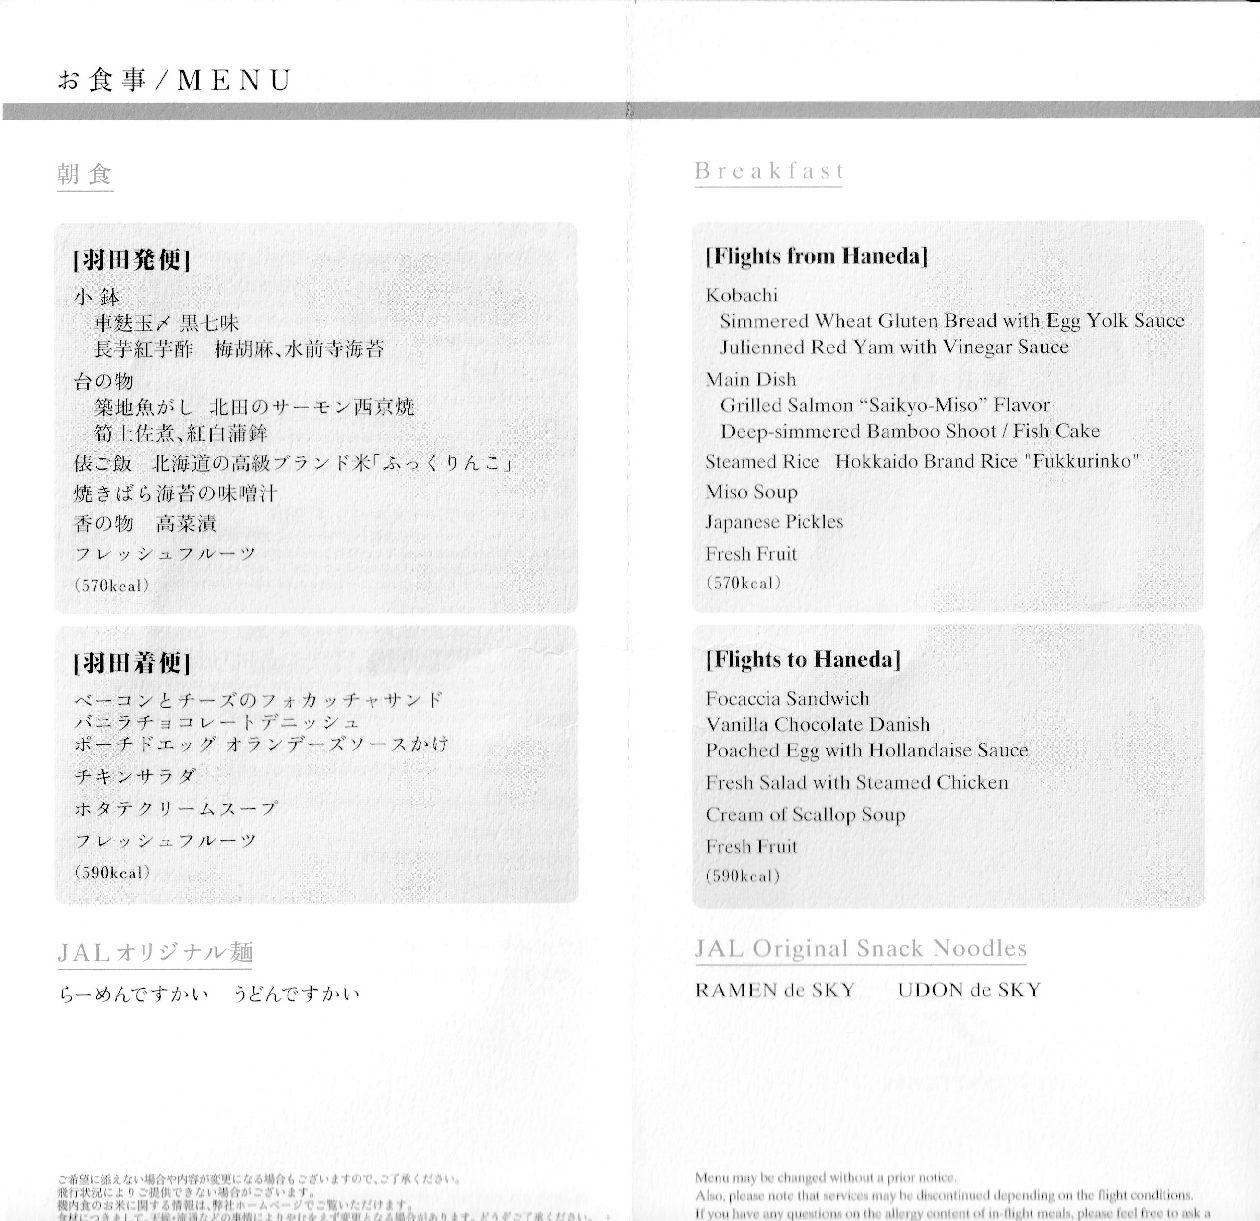 jl_menu_1